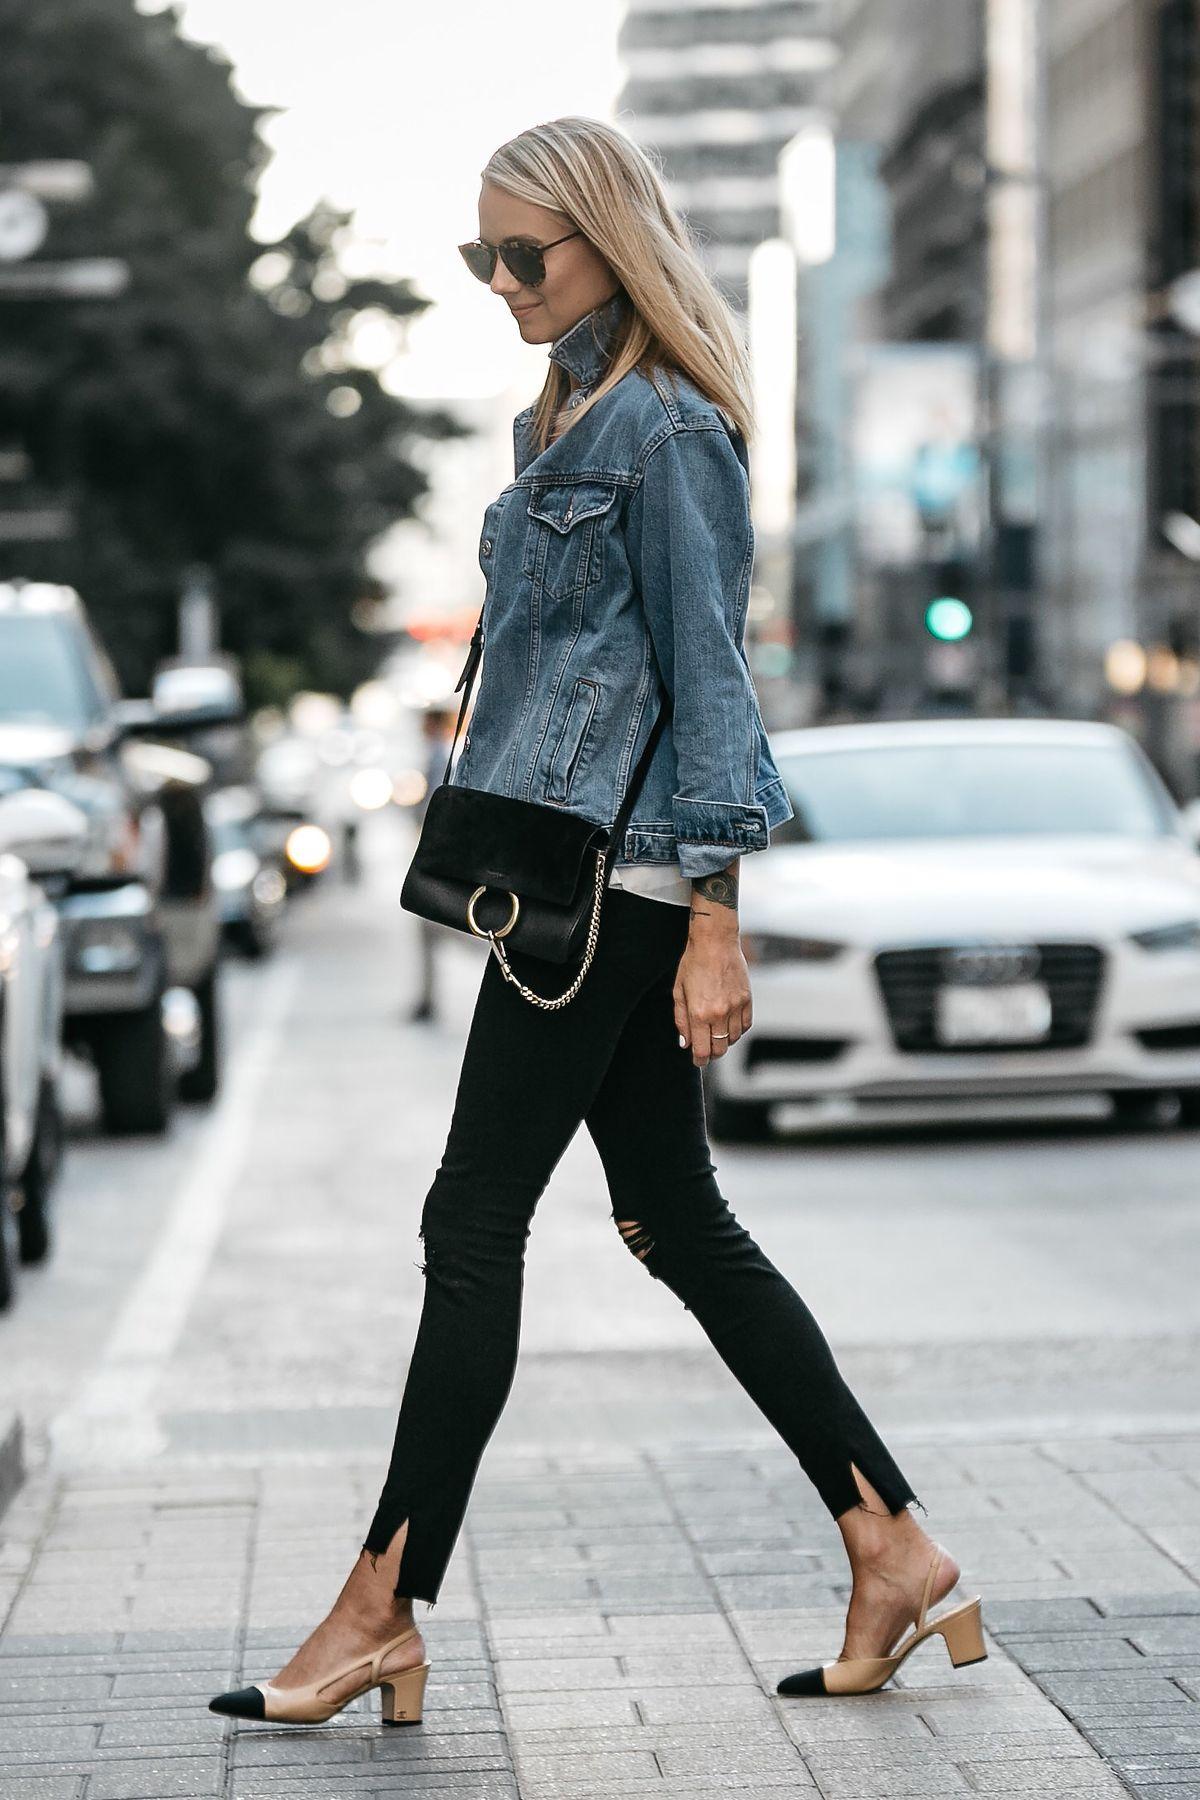 7381466cff Blonde Woman Wearing Topshop Oversized Denim Jacket Frame Black Ripped  Skinny Jeans Chloe Faye Handbag Chanel Slingbacks Fashion Jackson Dallas  Blogger ...